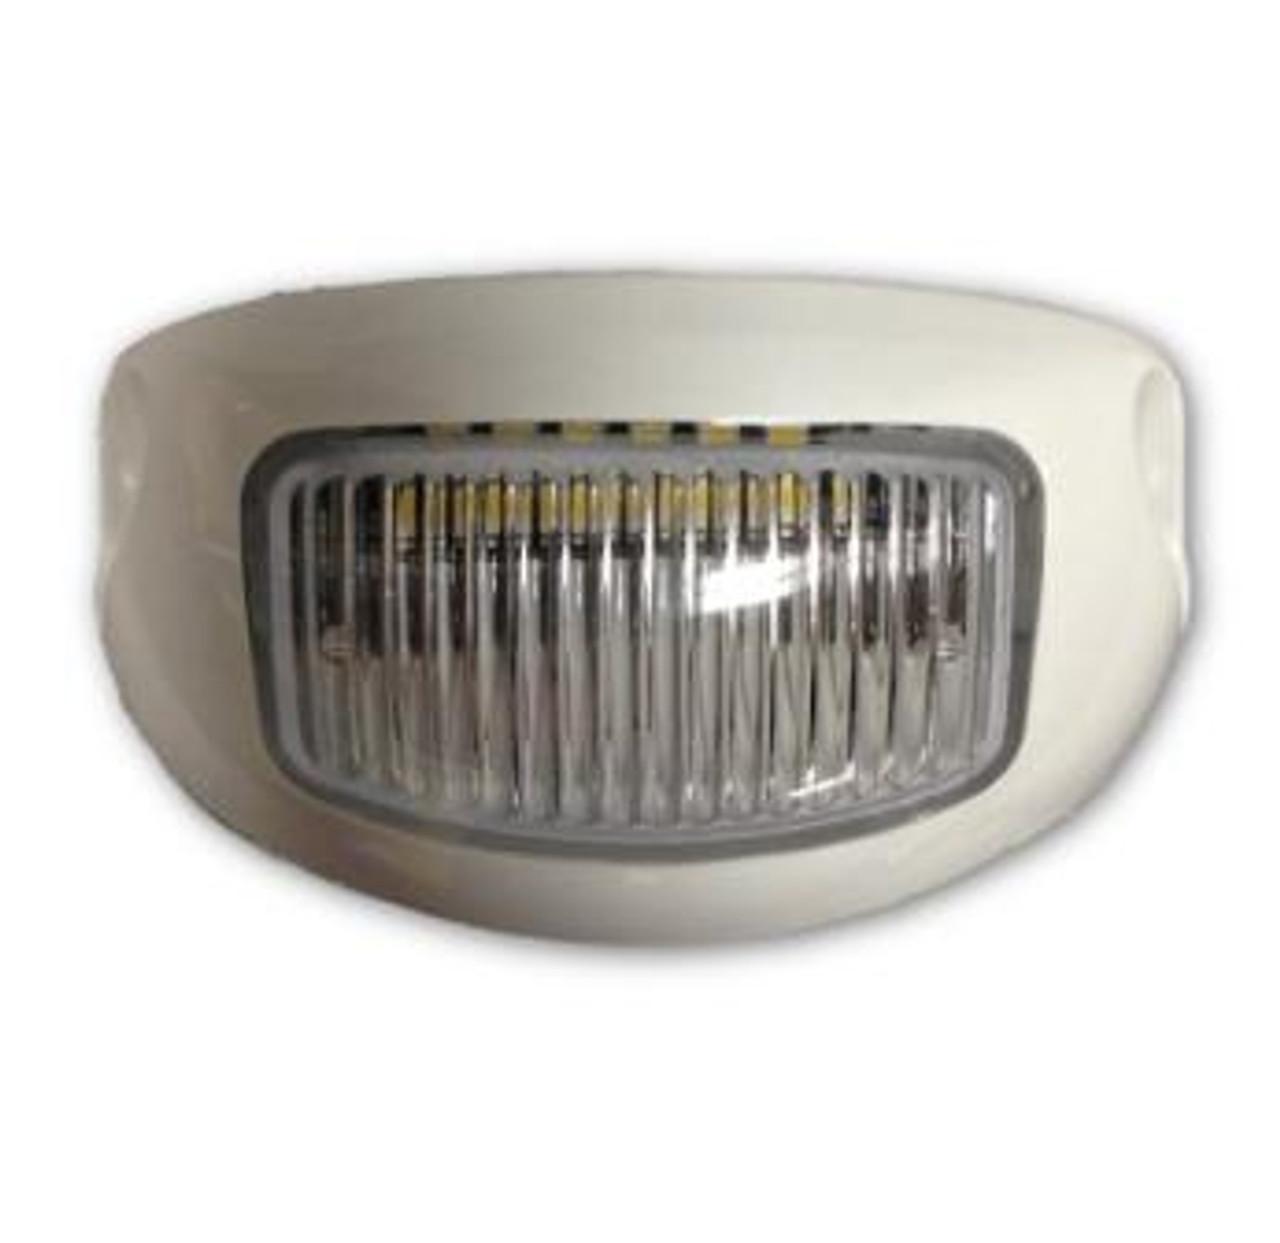 Rigid Loop Festoon LED Replacement Bulb